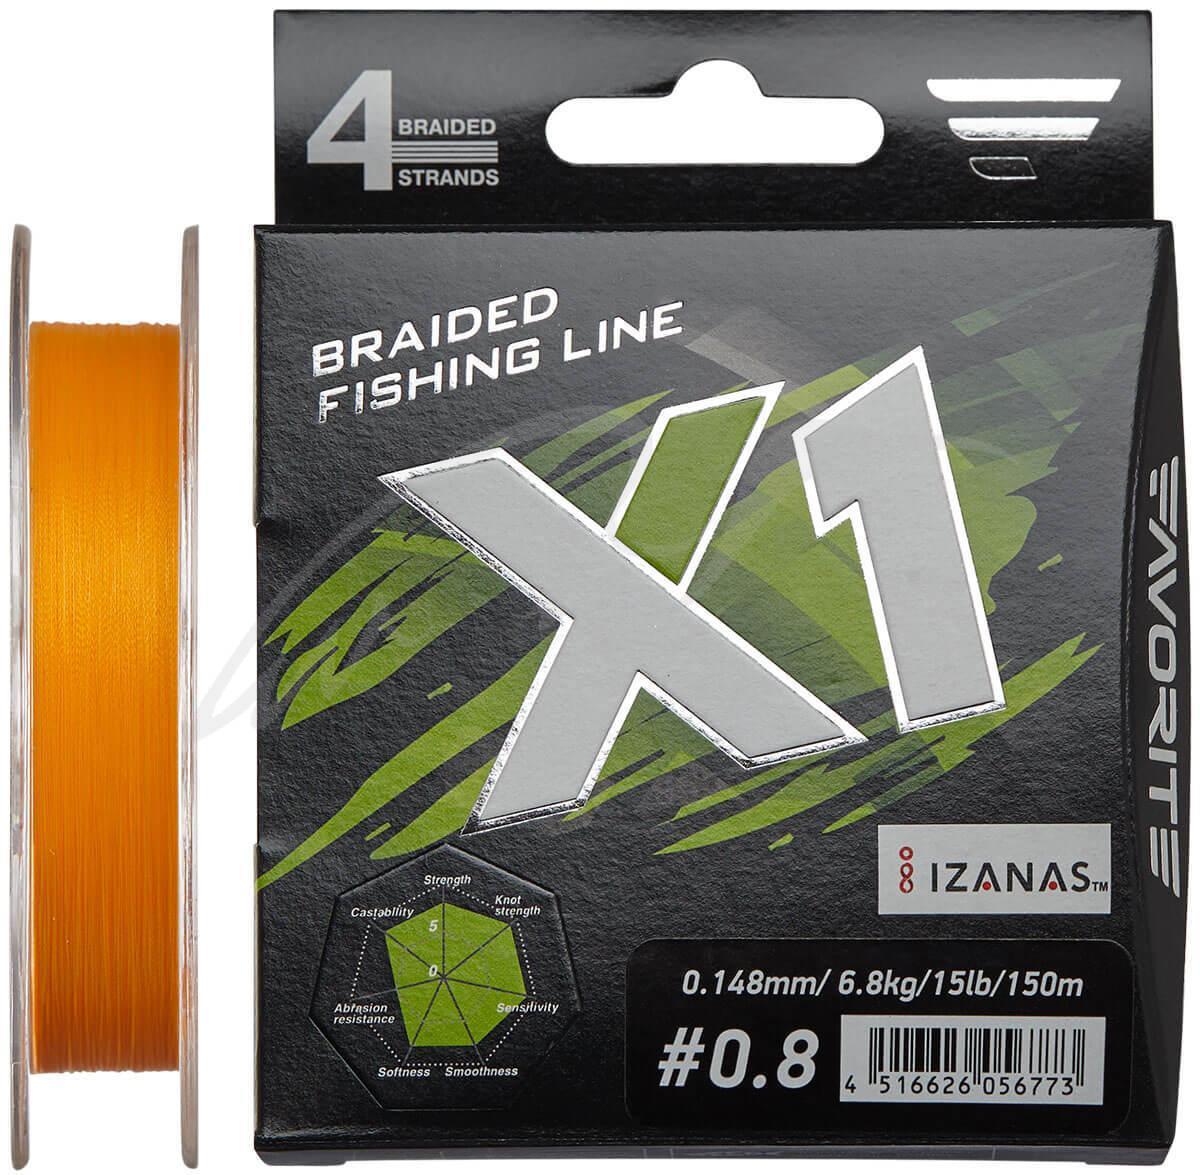 Шнур Favorite X1 PE 4x 150m (orange) #0.8/0.148mm 15lb/6.8kg